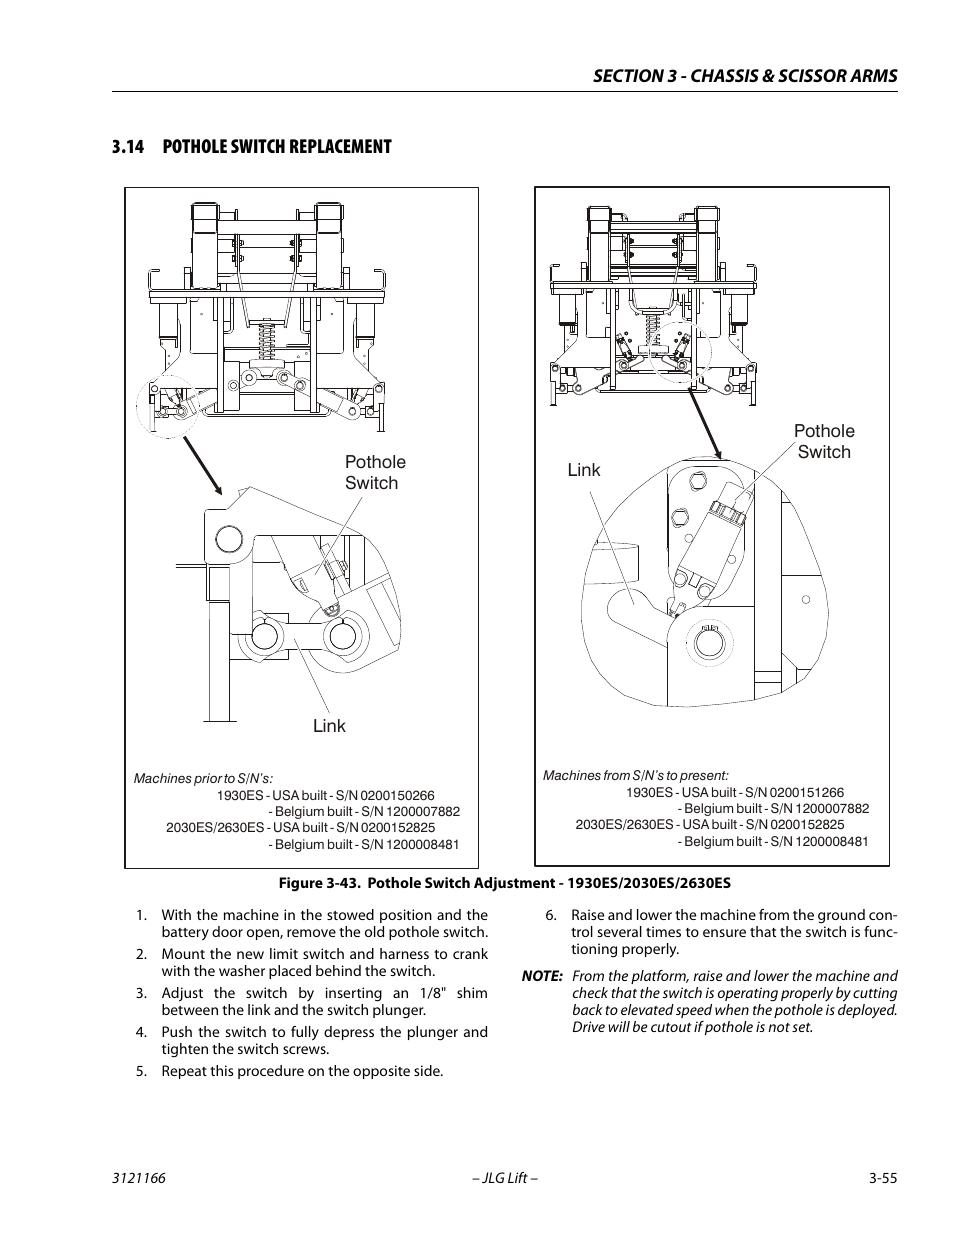 e6088e jlg scissor lift service manual   wiring library  wiring library